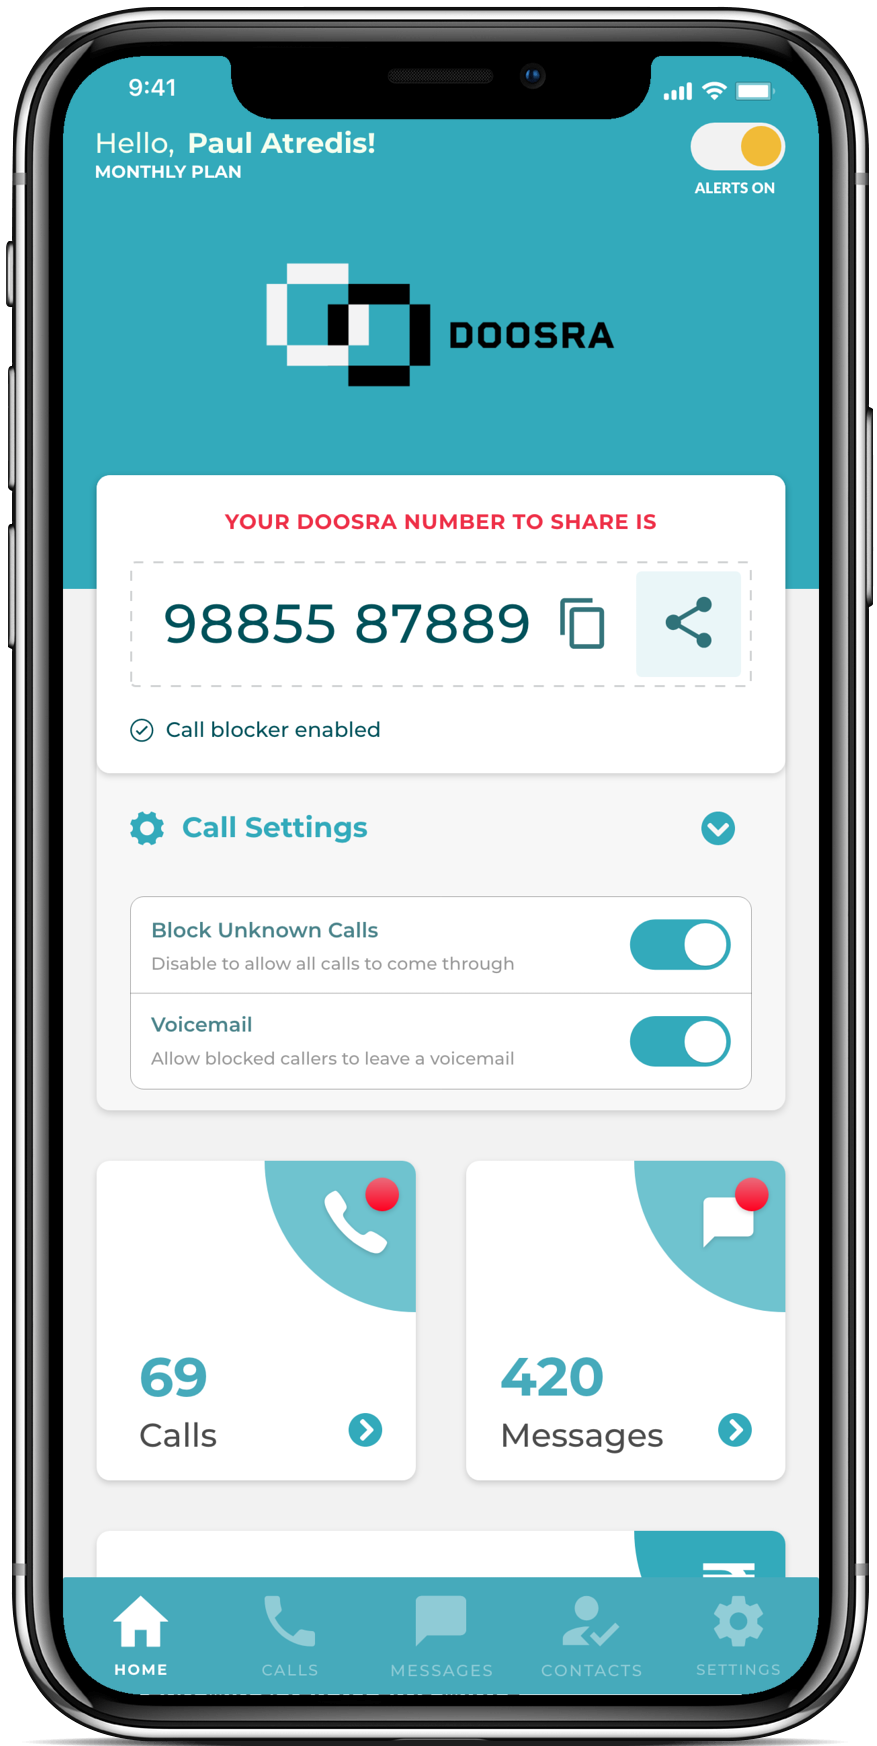 Doosra Homescreen on an iPhone